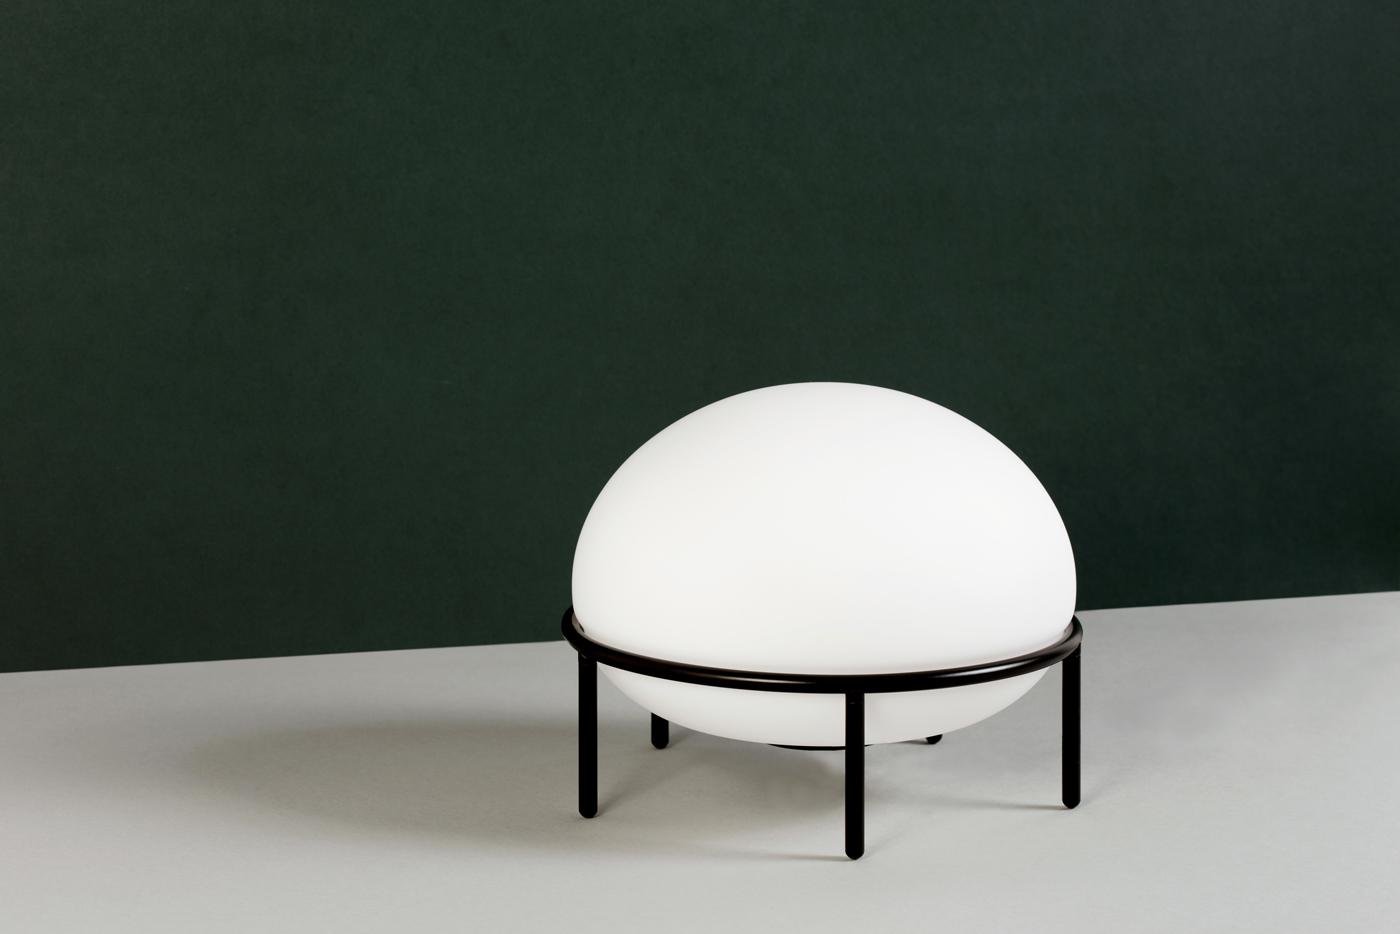 Minimalist Table Lamp 'Pump' by Kutarq